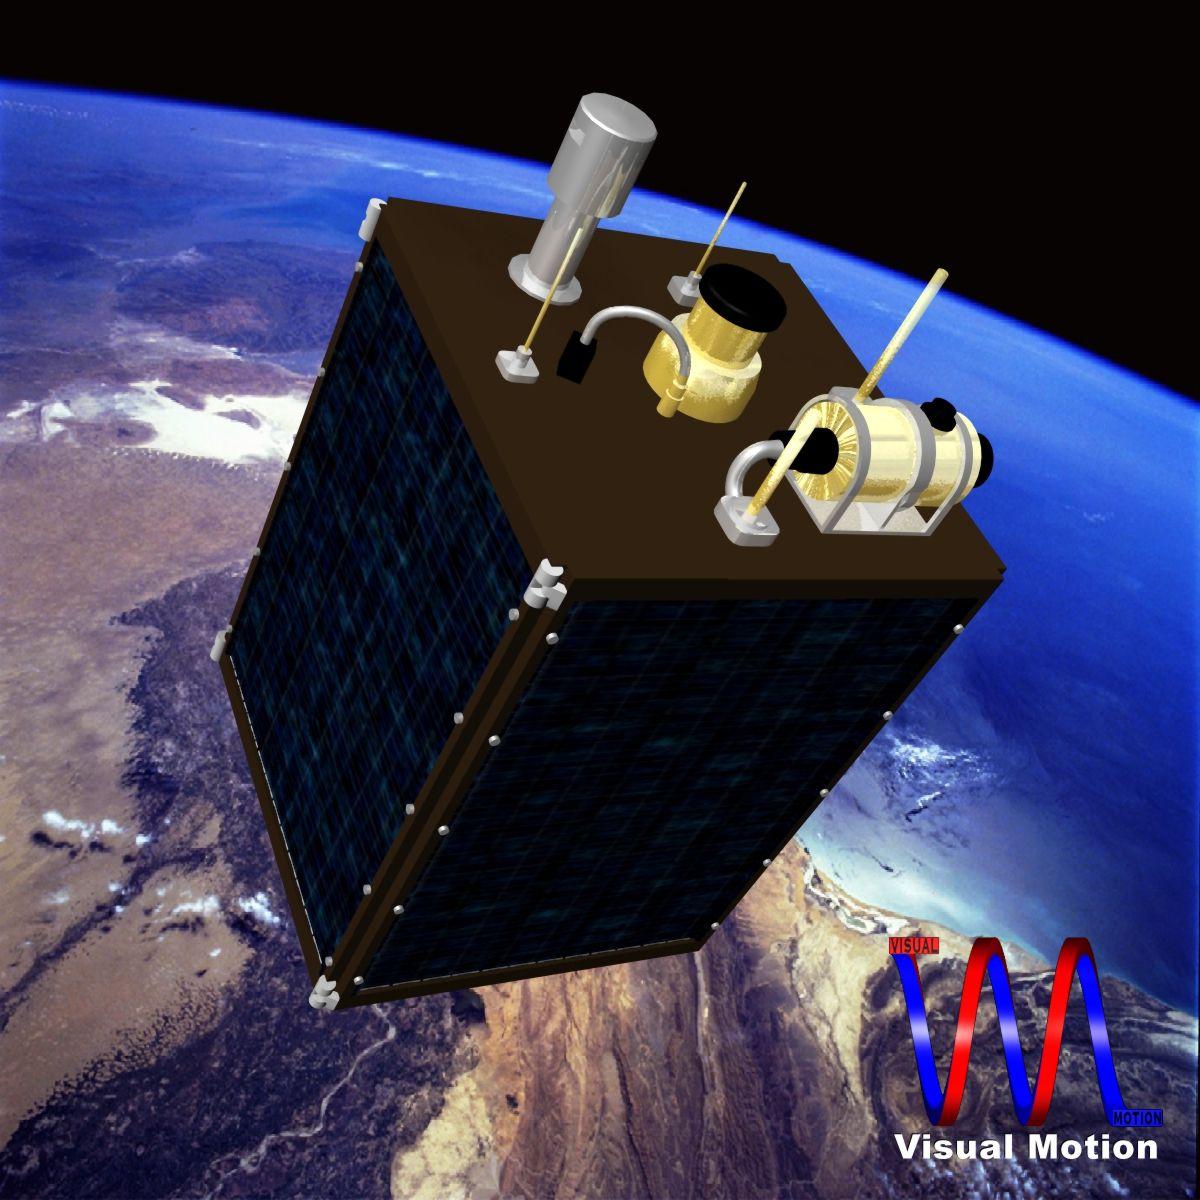 dprk kwangmyongsong-3 satelit 3d model 3ds dxf cob x obj 134453